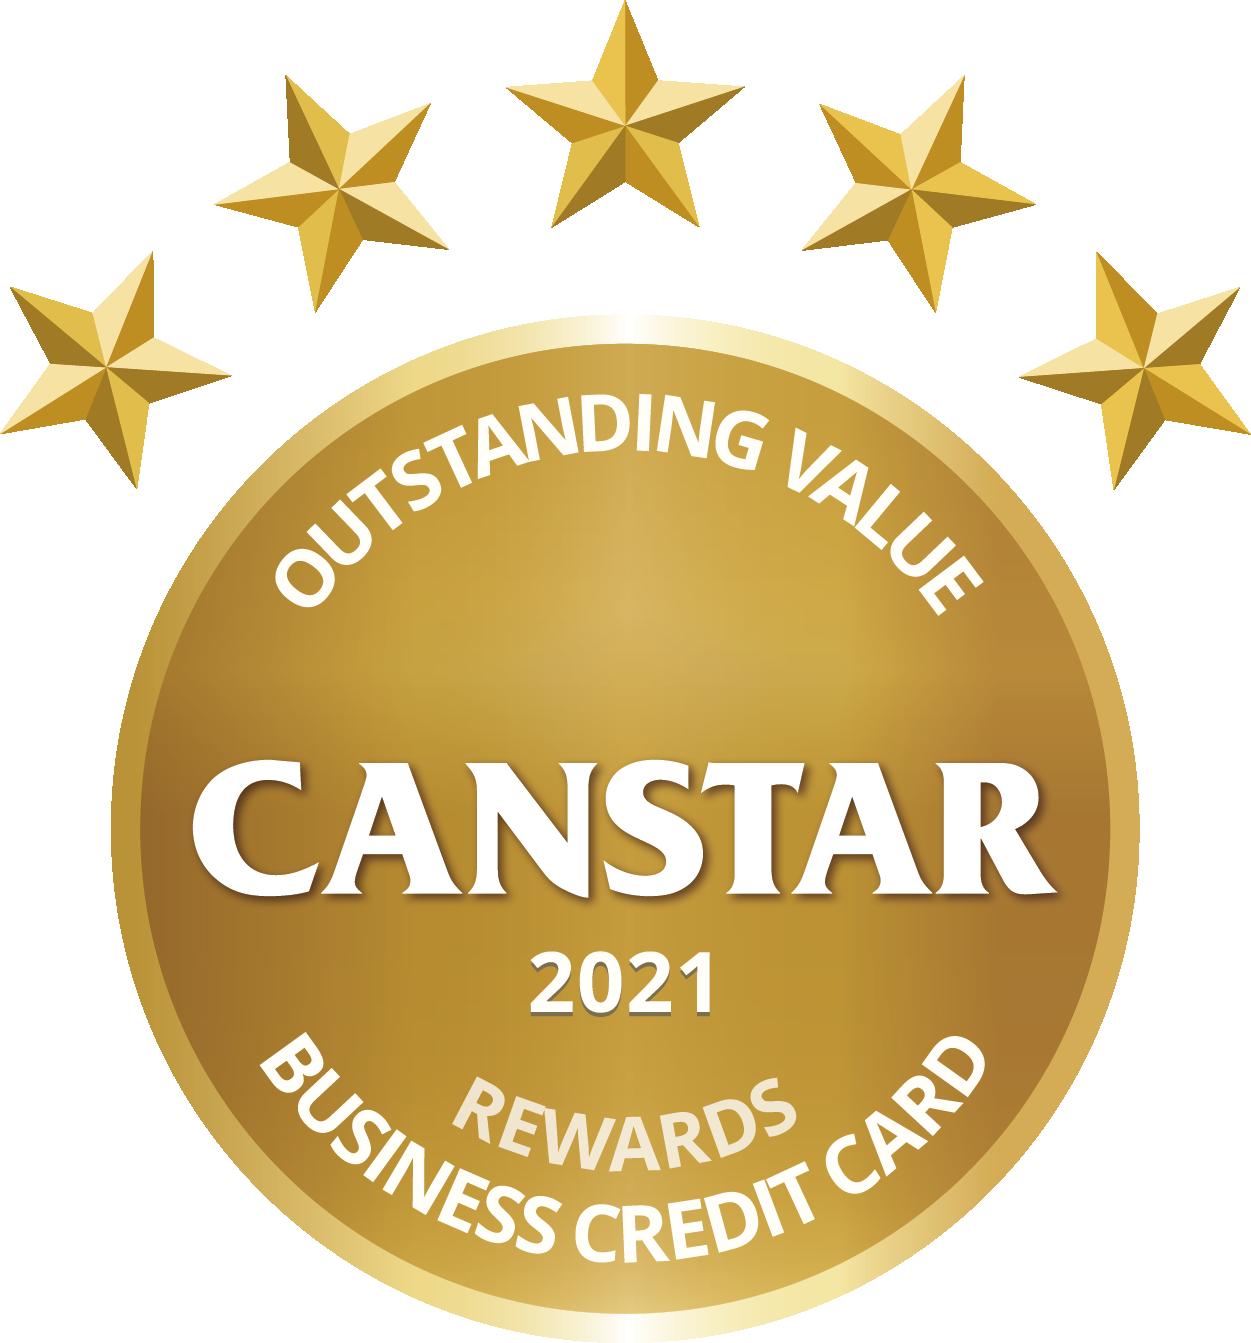 canstar rewards business card award logo